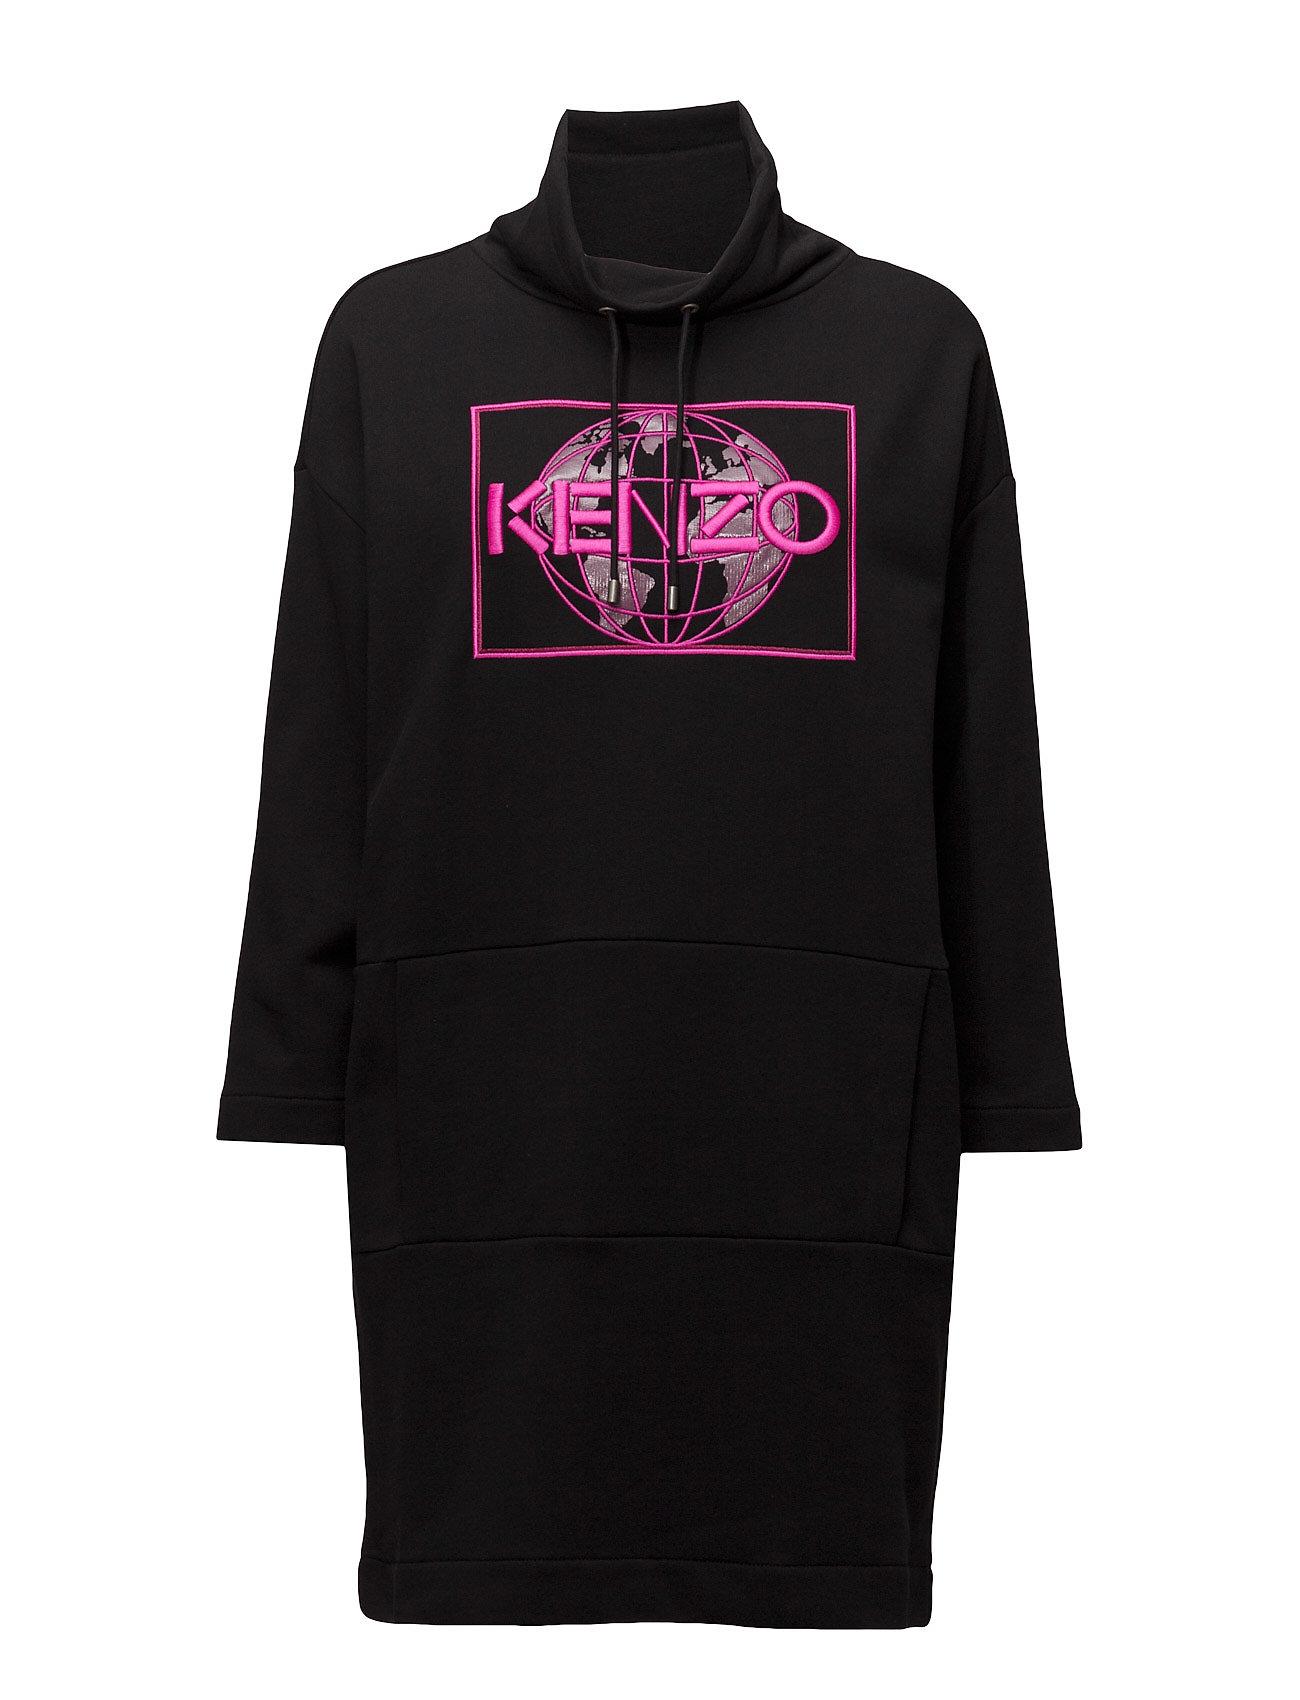 kenzo – Dresses main fra boozt.com dk